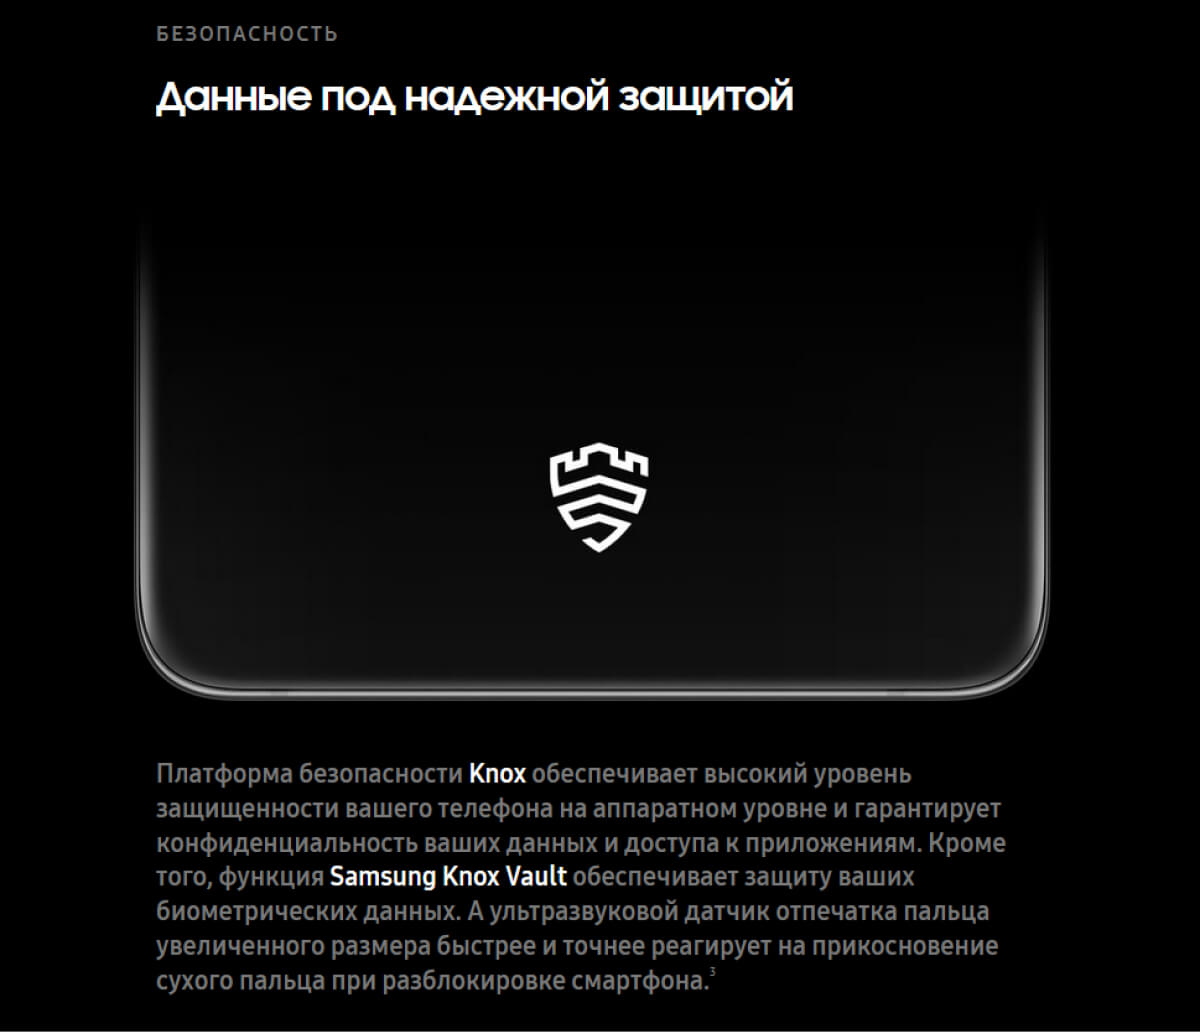 Samsung Galaxy S21 Ultra 5G Чёрный фантом цена